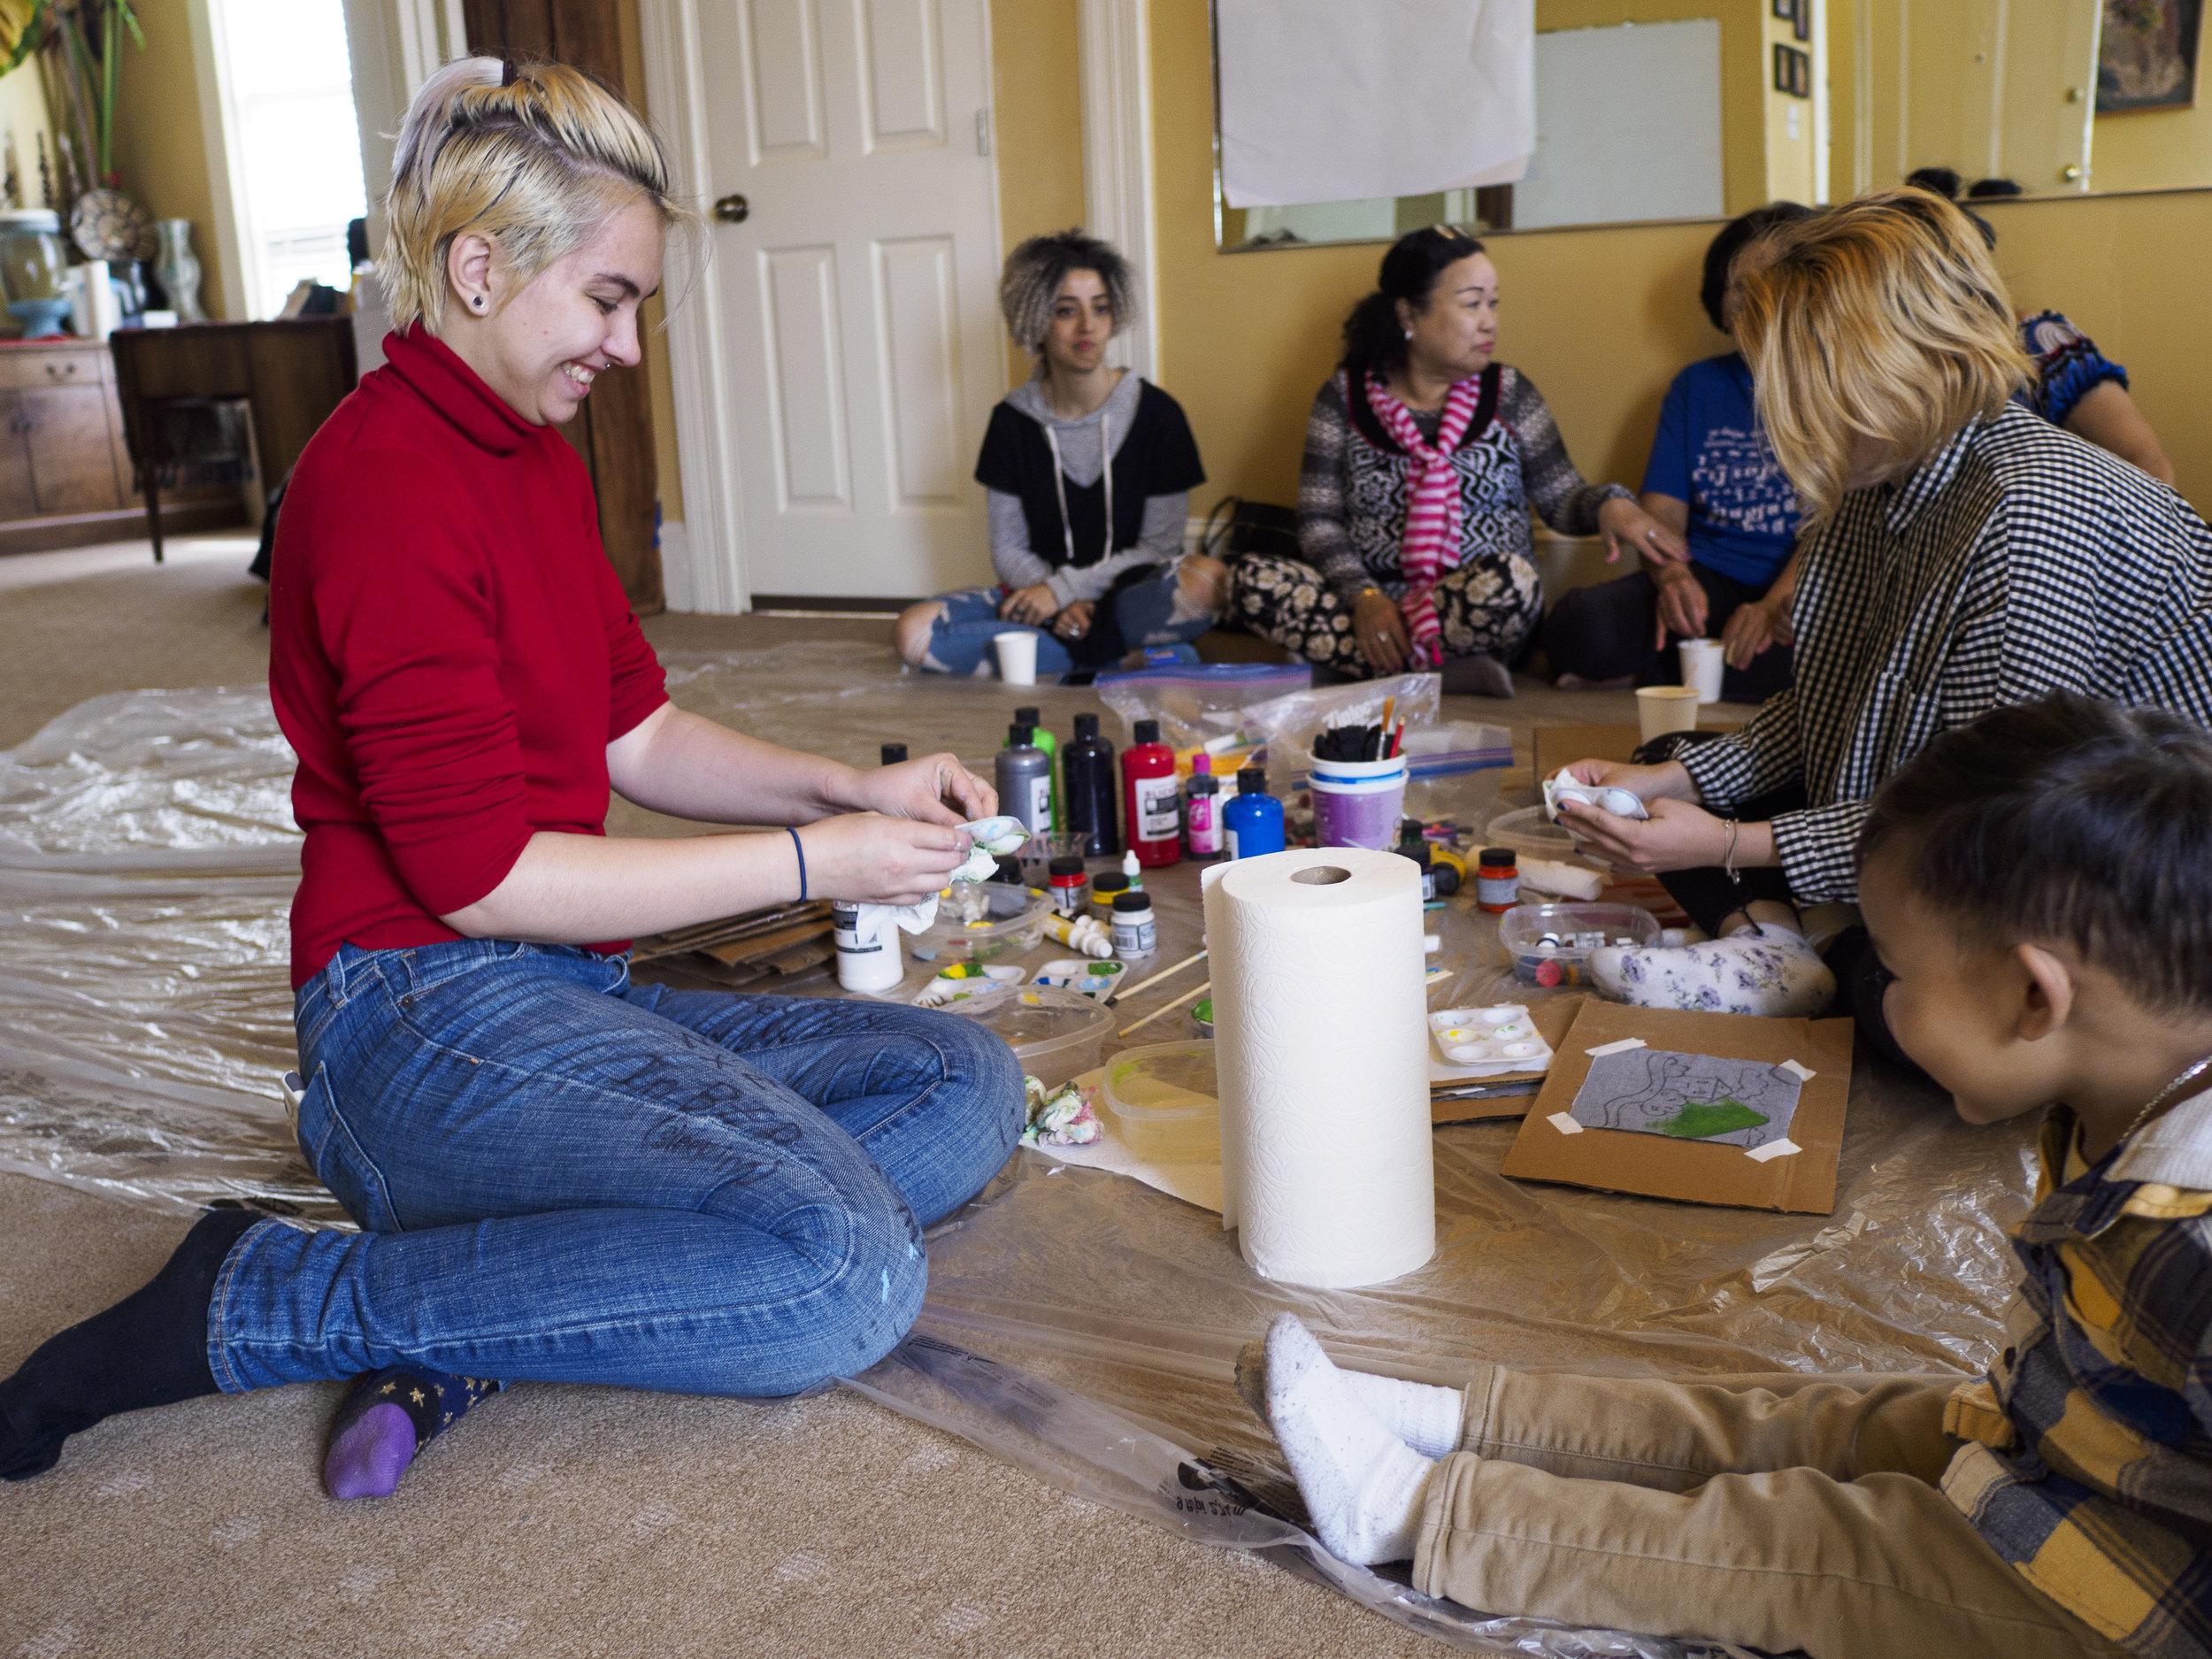 fabric-painting-artogether-women-1.jpg